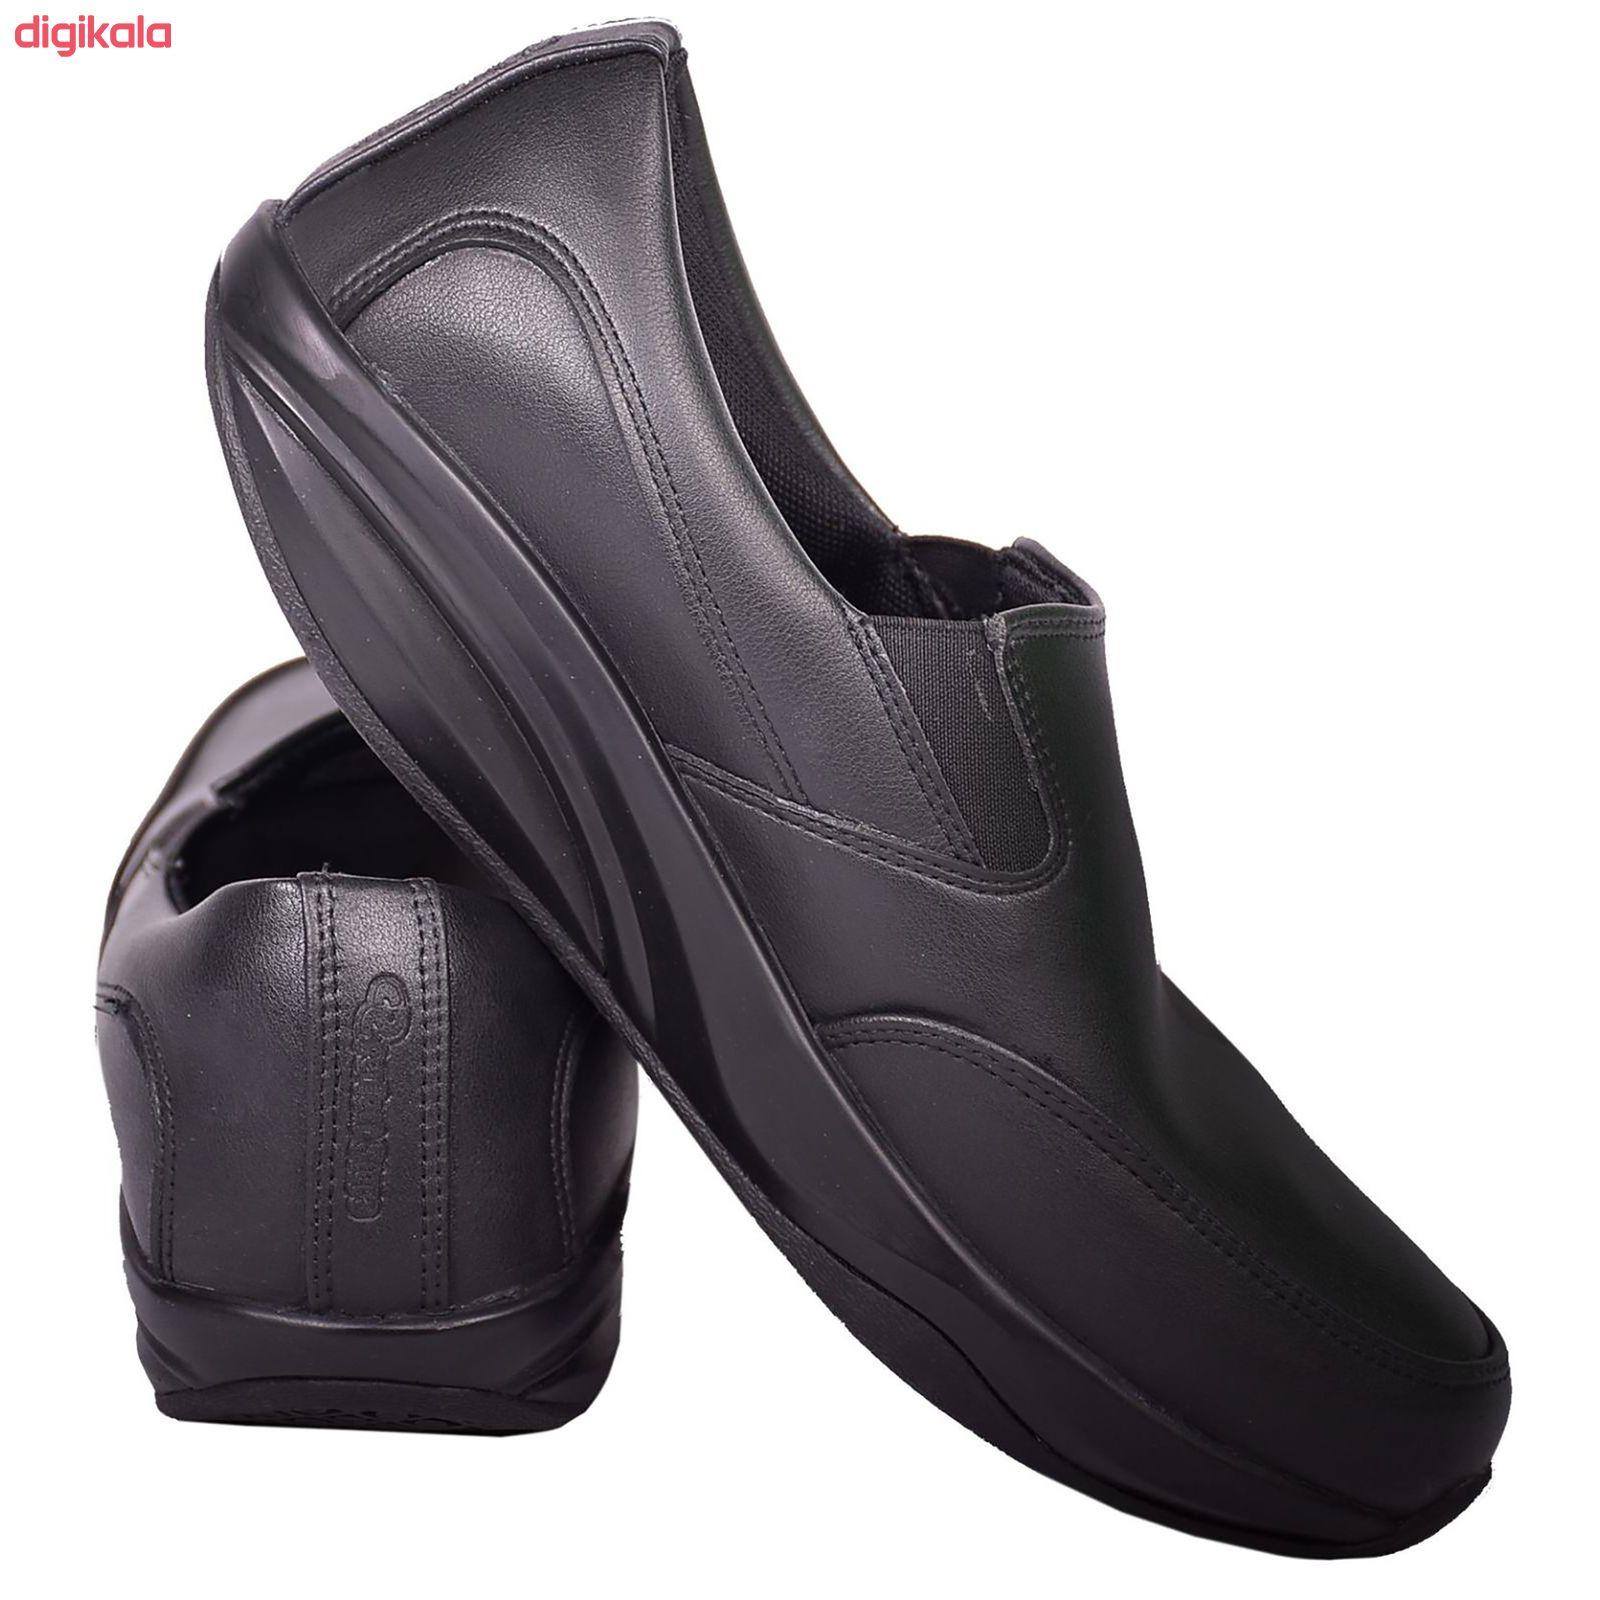 کفش مخصوص پیاده روی زنانه پرفکت استپس مدل پریمو کژوال رنگ مشکی main 1 3